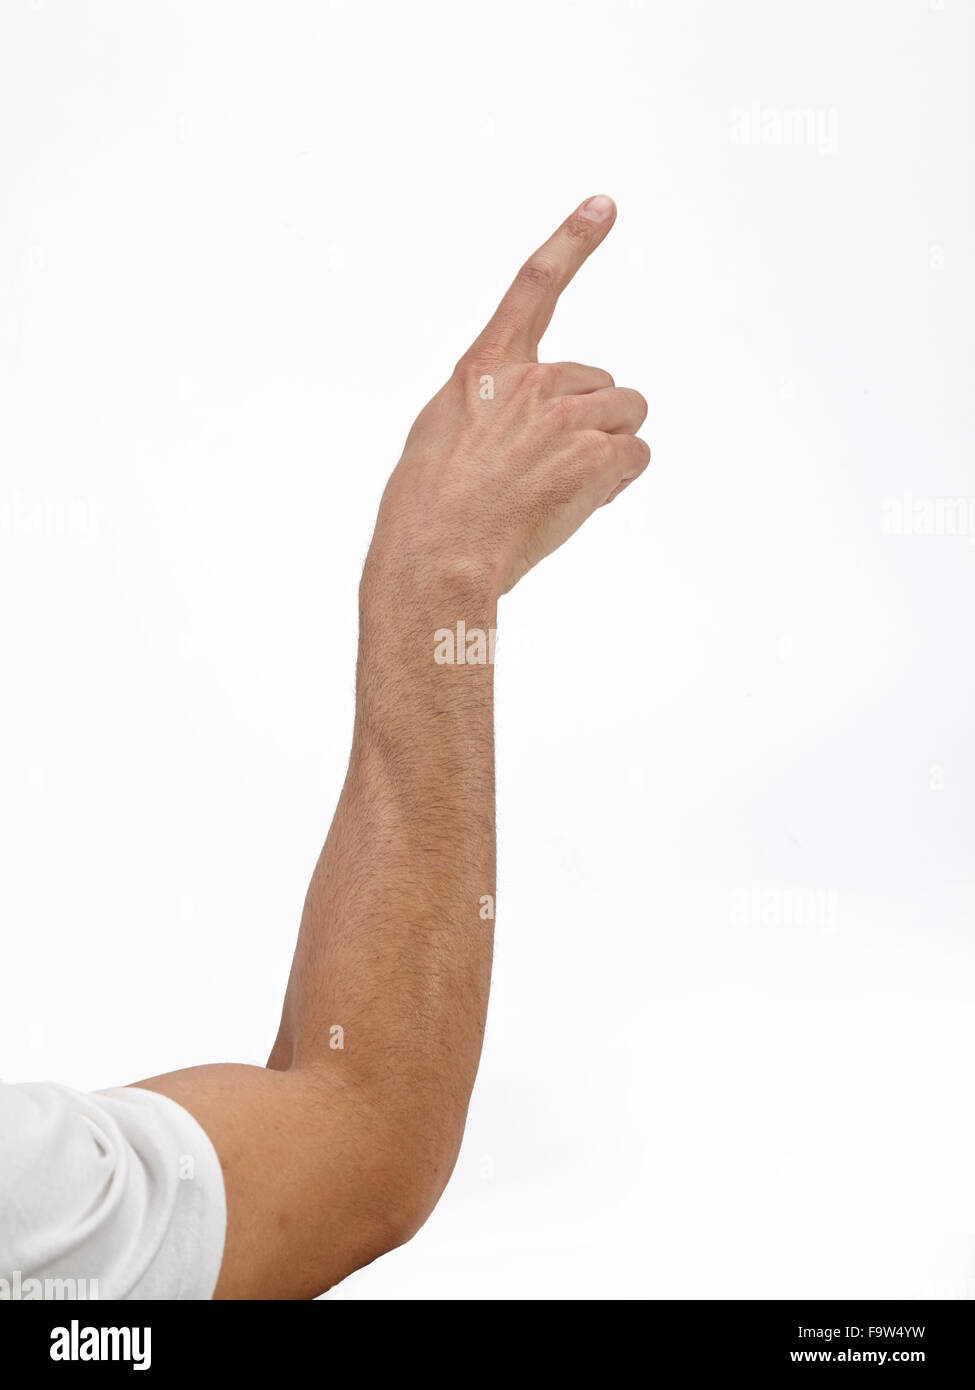 Brazo mano caucásicos blancos finger pointing Imagen De Stock